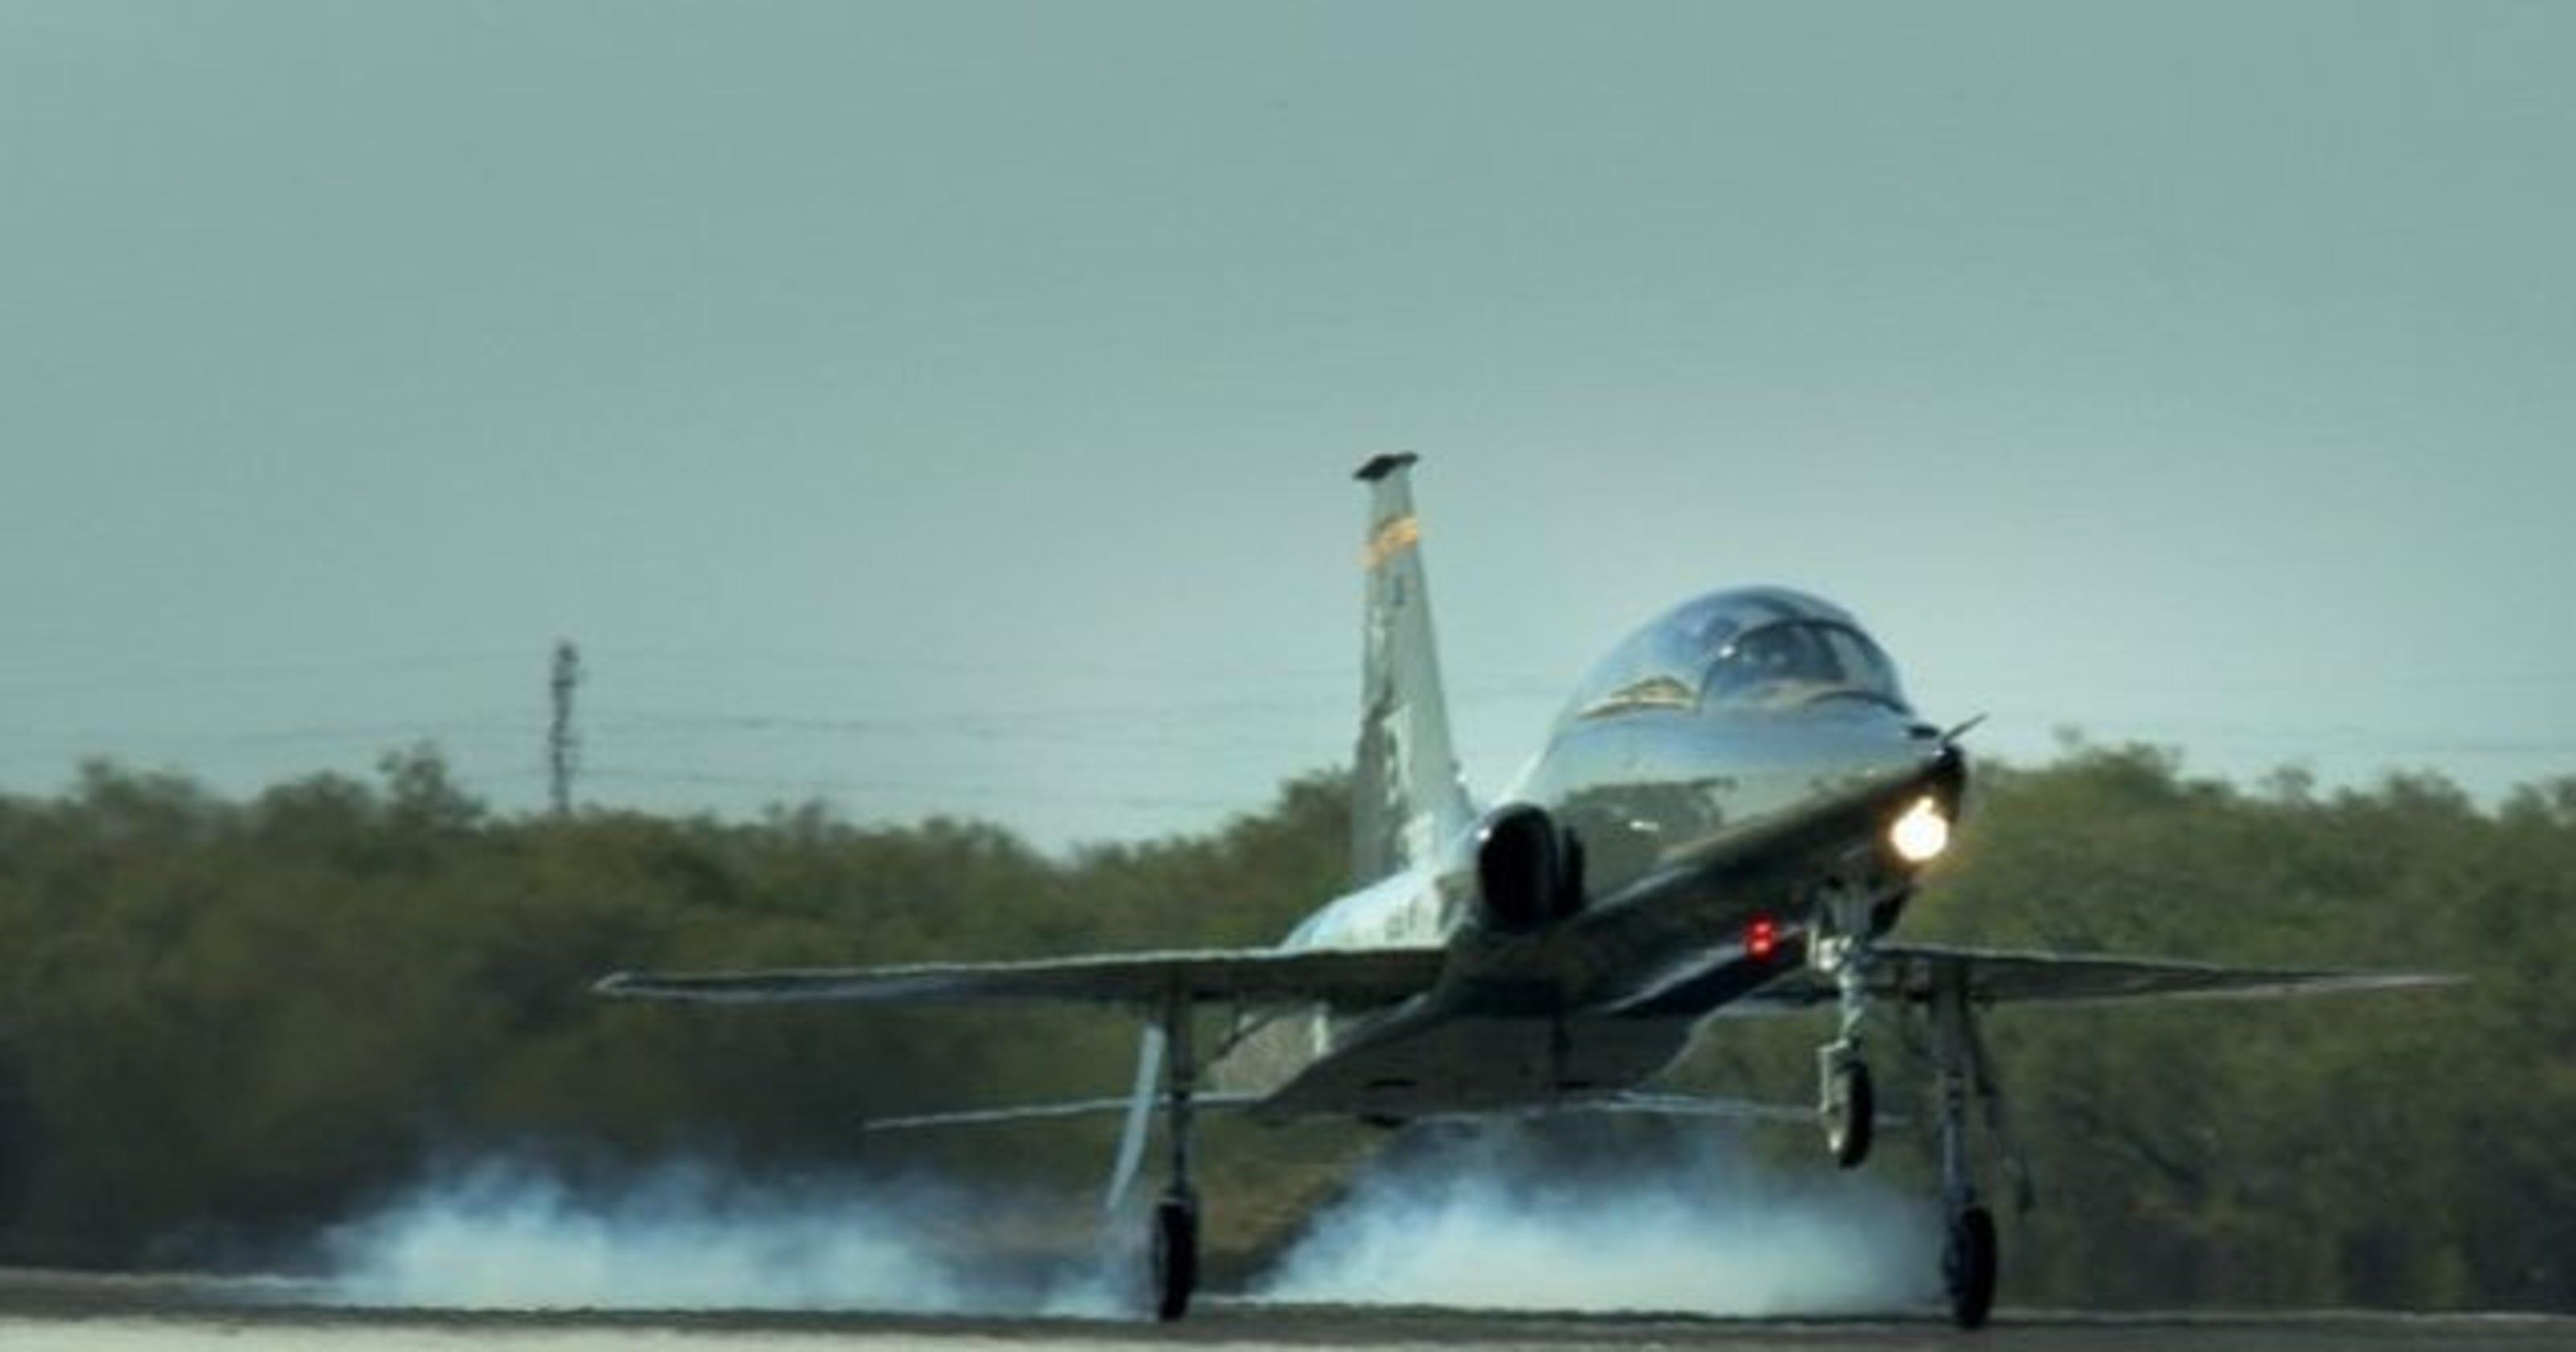 ExpressJet aircraft maintenance facility to close